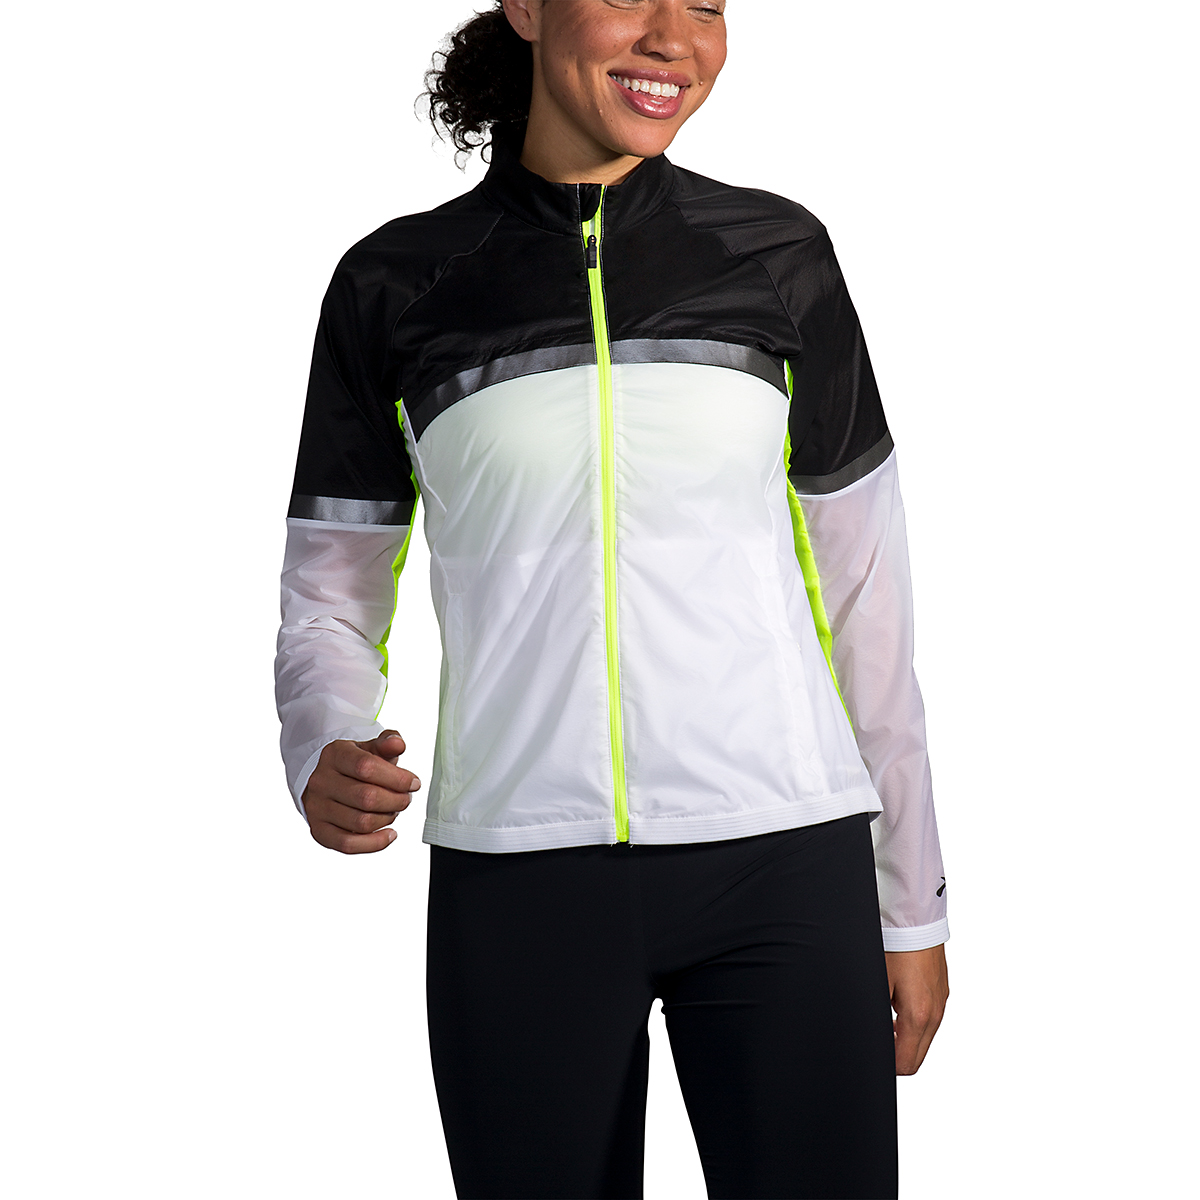 Women's Brooks Run Visible Carbonite Jacket  - Color: Luminosity - Size: XS, Luminosity, large, image 1